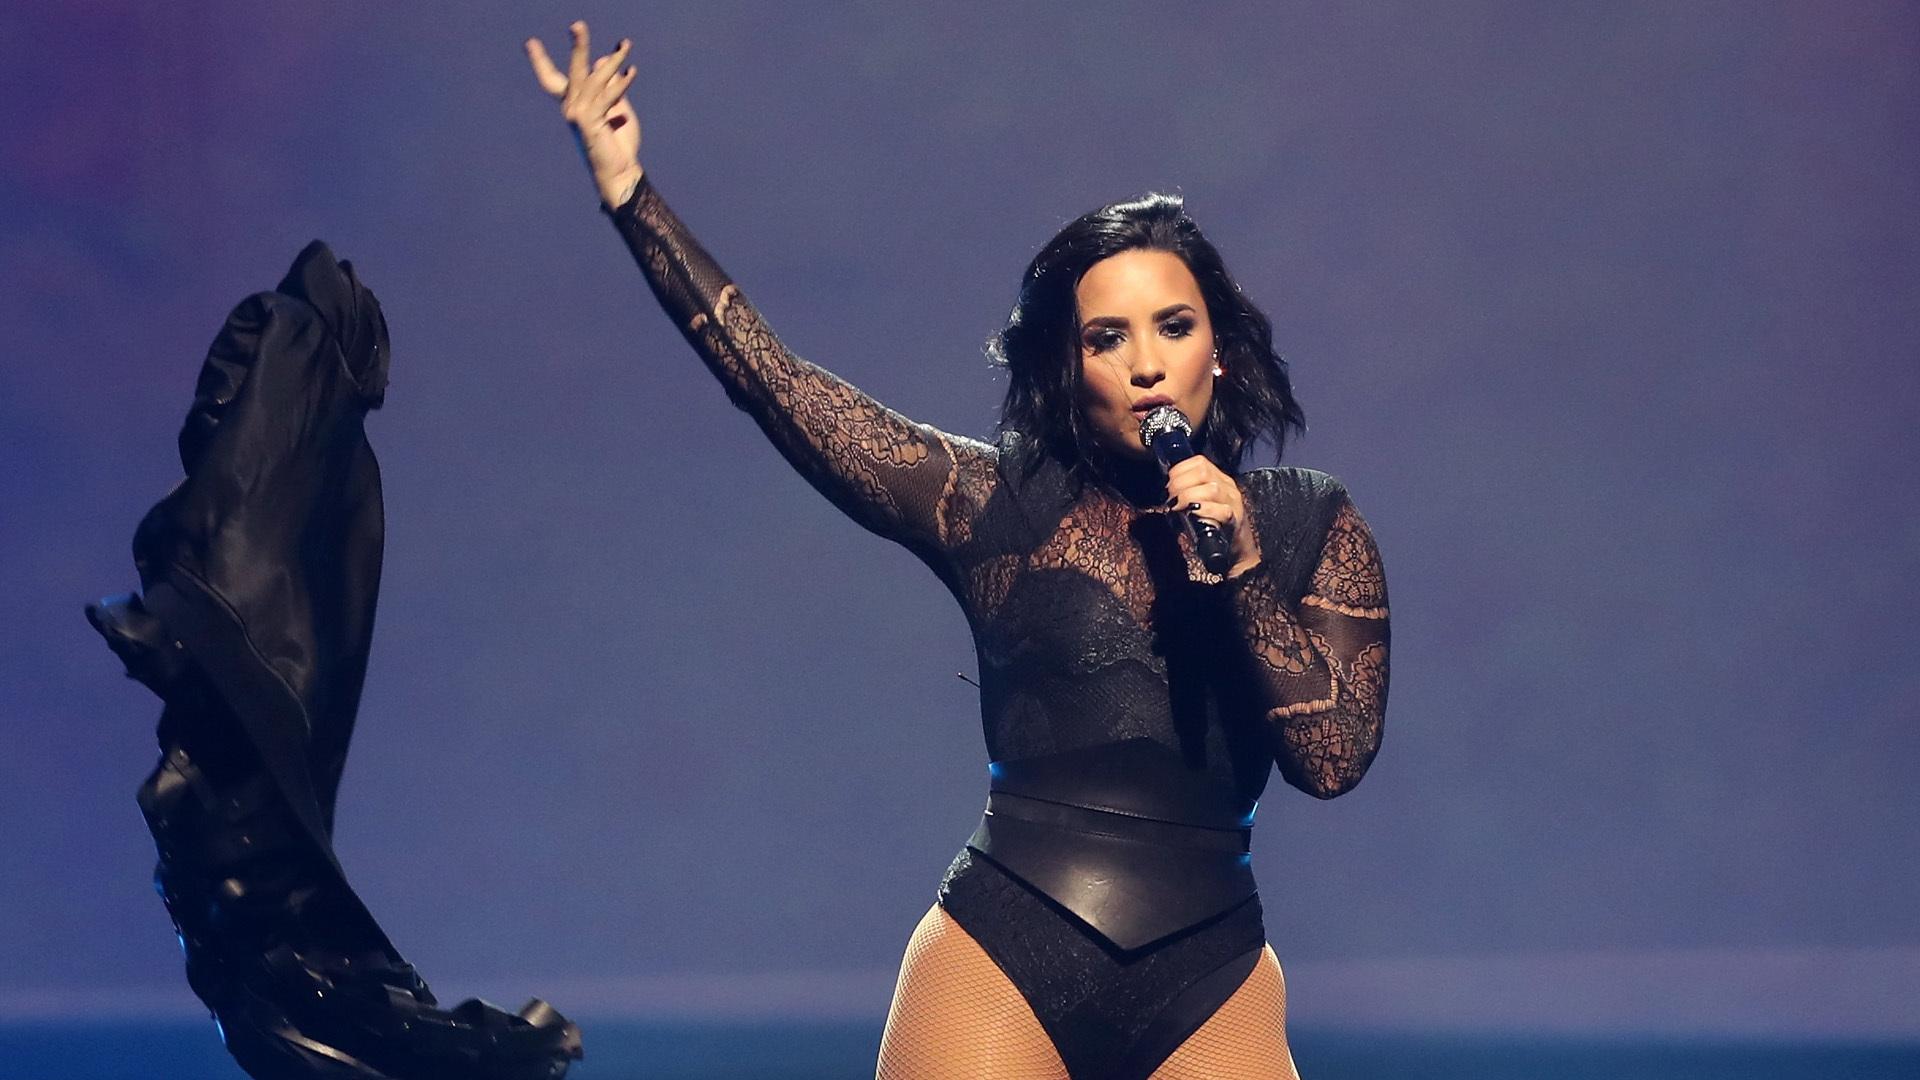 Demi Lovato Short Images